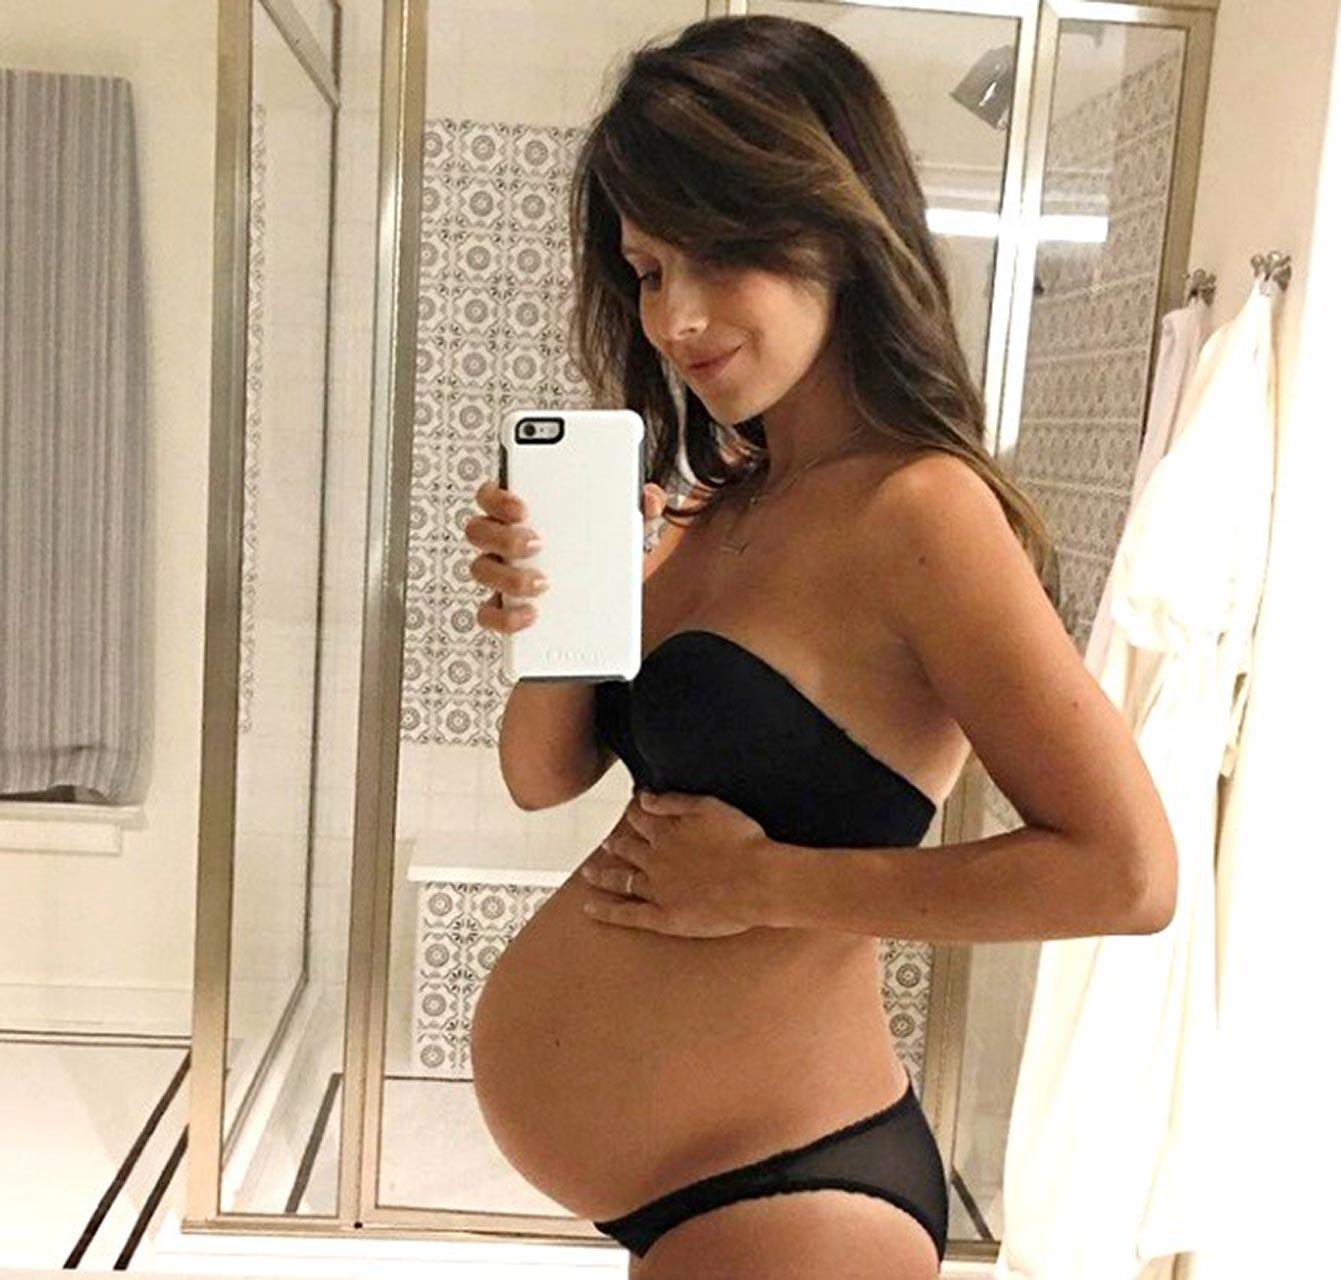 Hilaria Baldwin Thomas Nude Pantyless Selfie  Pregnant -8080